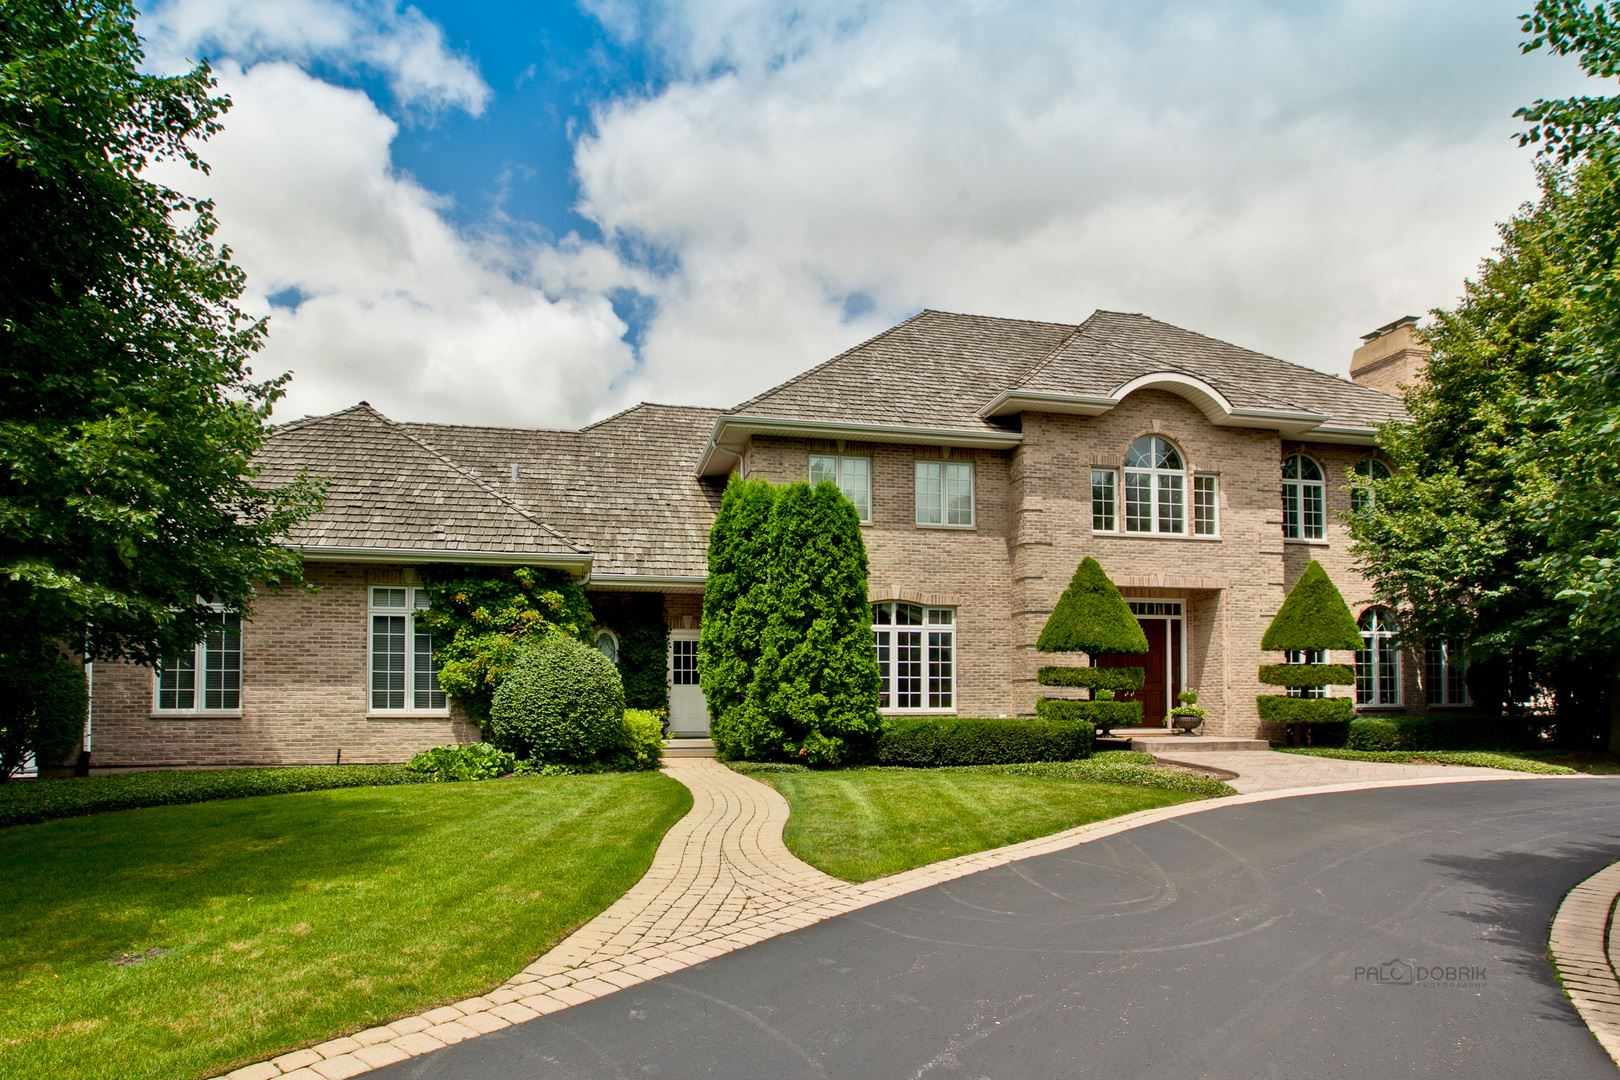 110 S Suffolk Lane, Lake Forest, IL 60045 - MLS#: 10513088